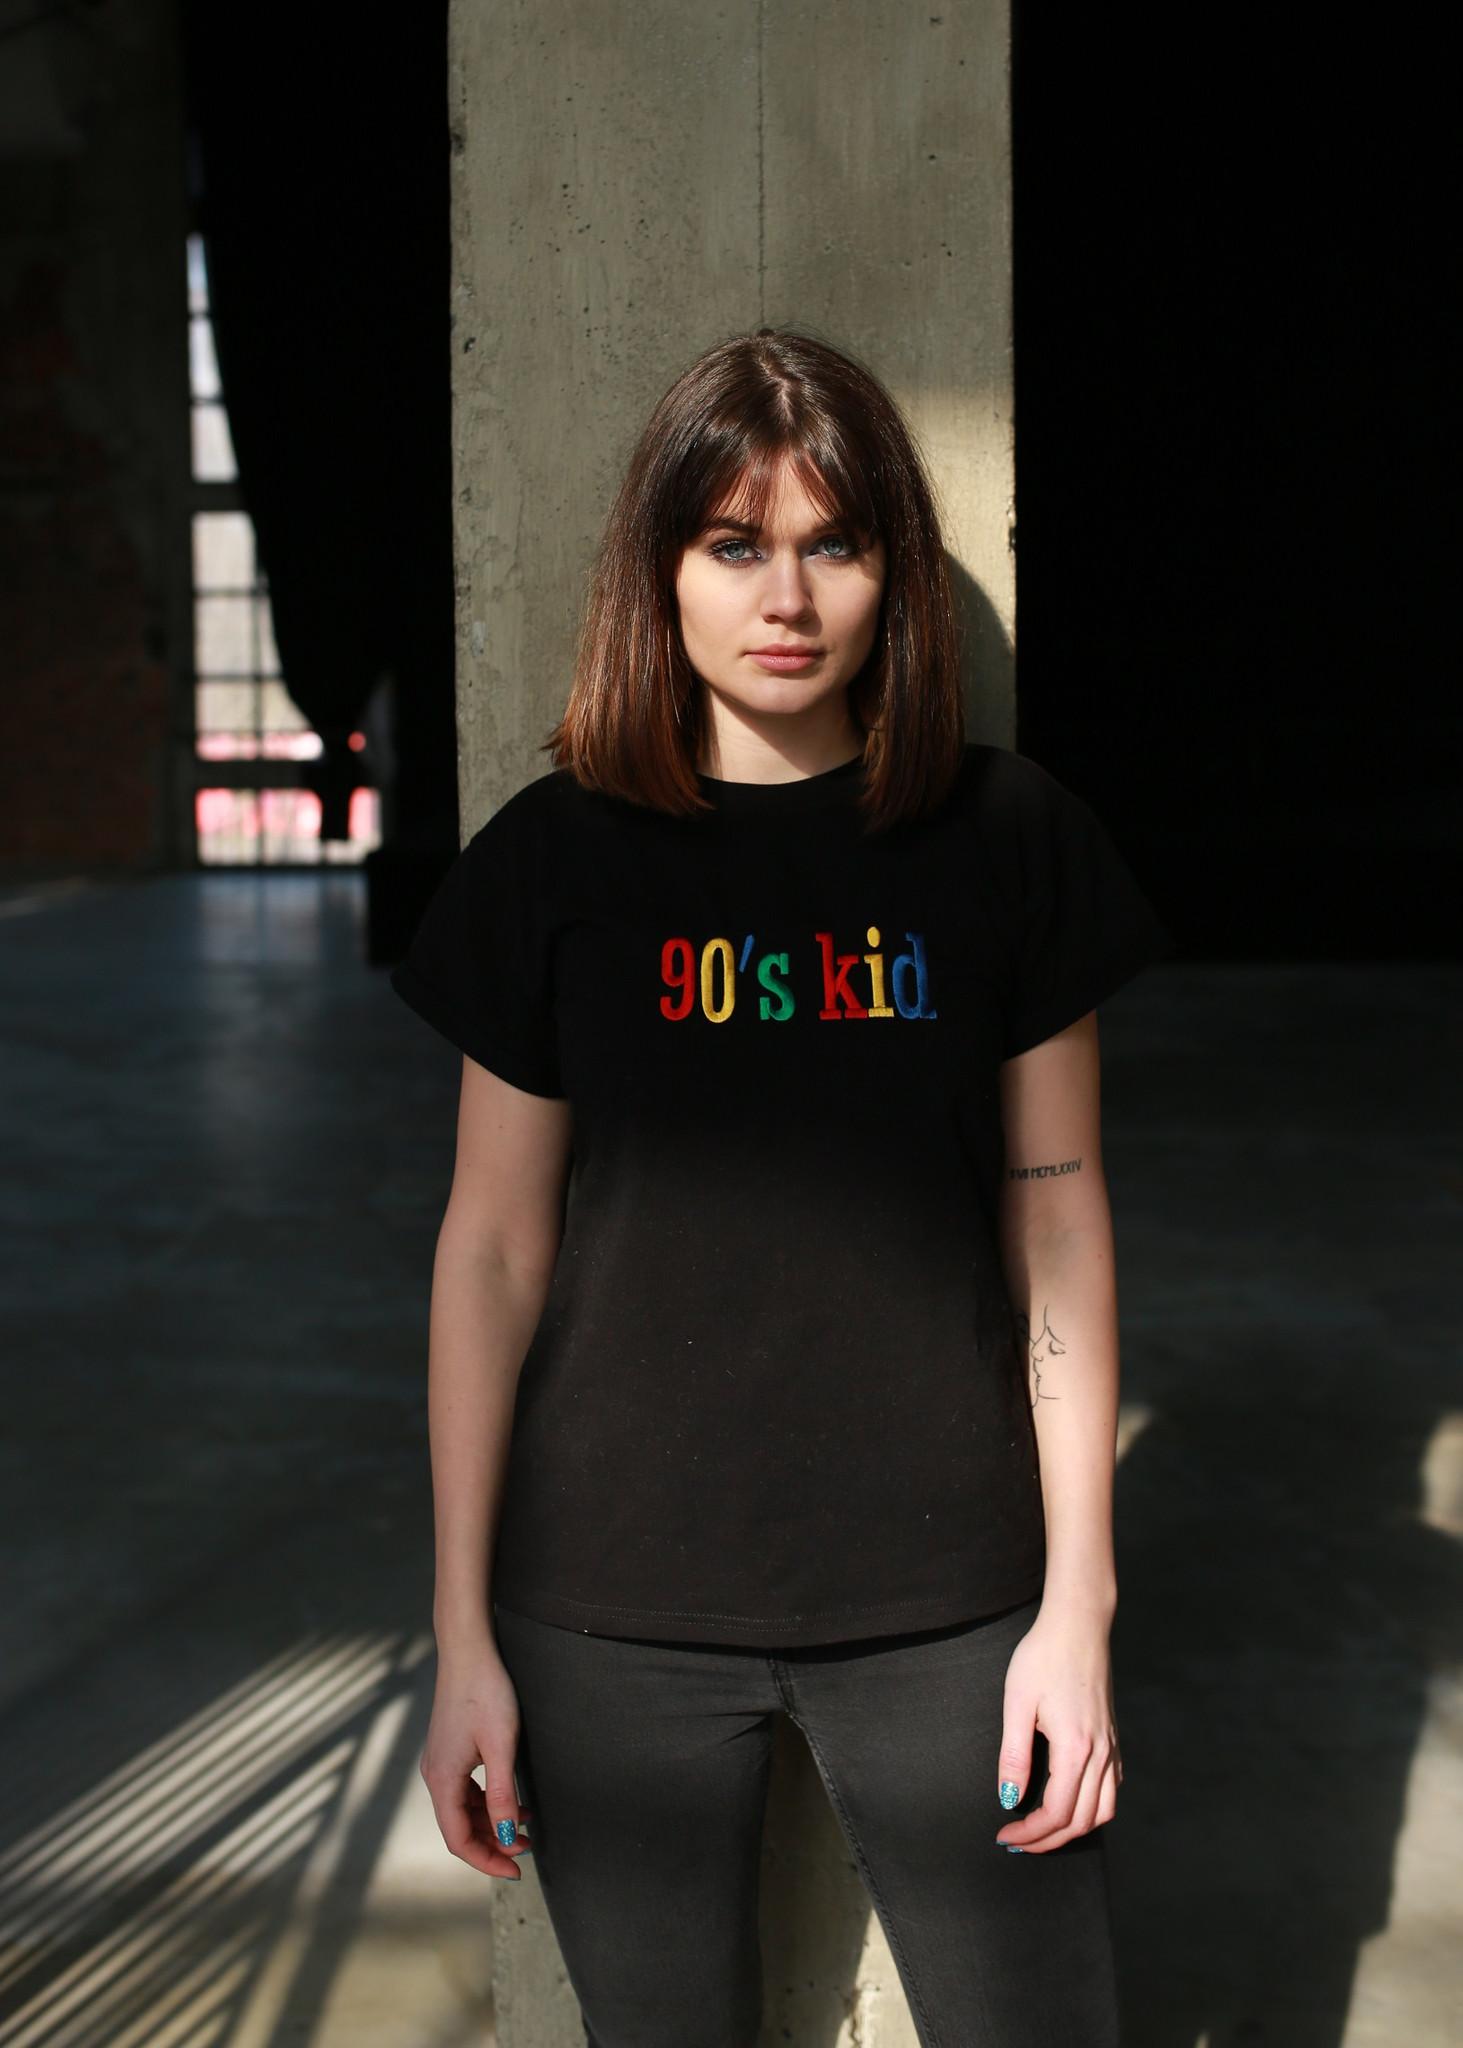 Czarny T-shirt 90's kid Black - whysoserious